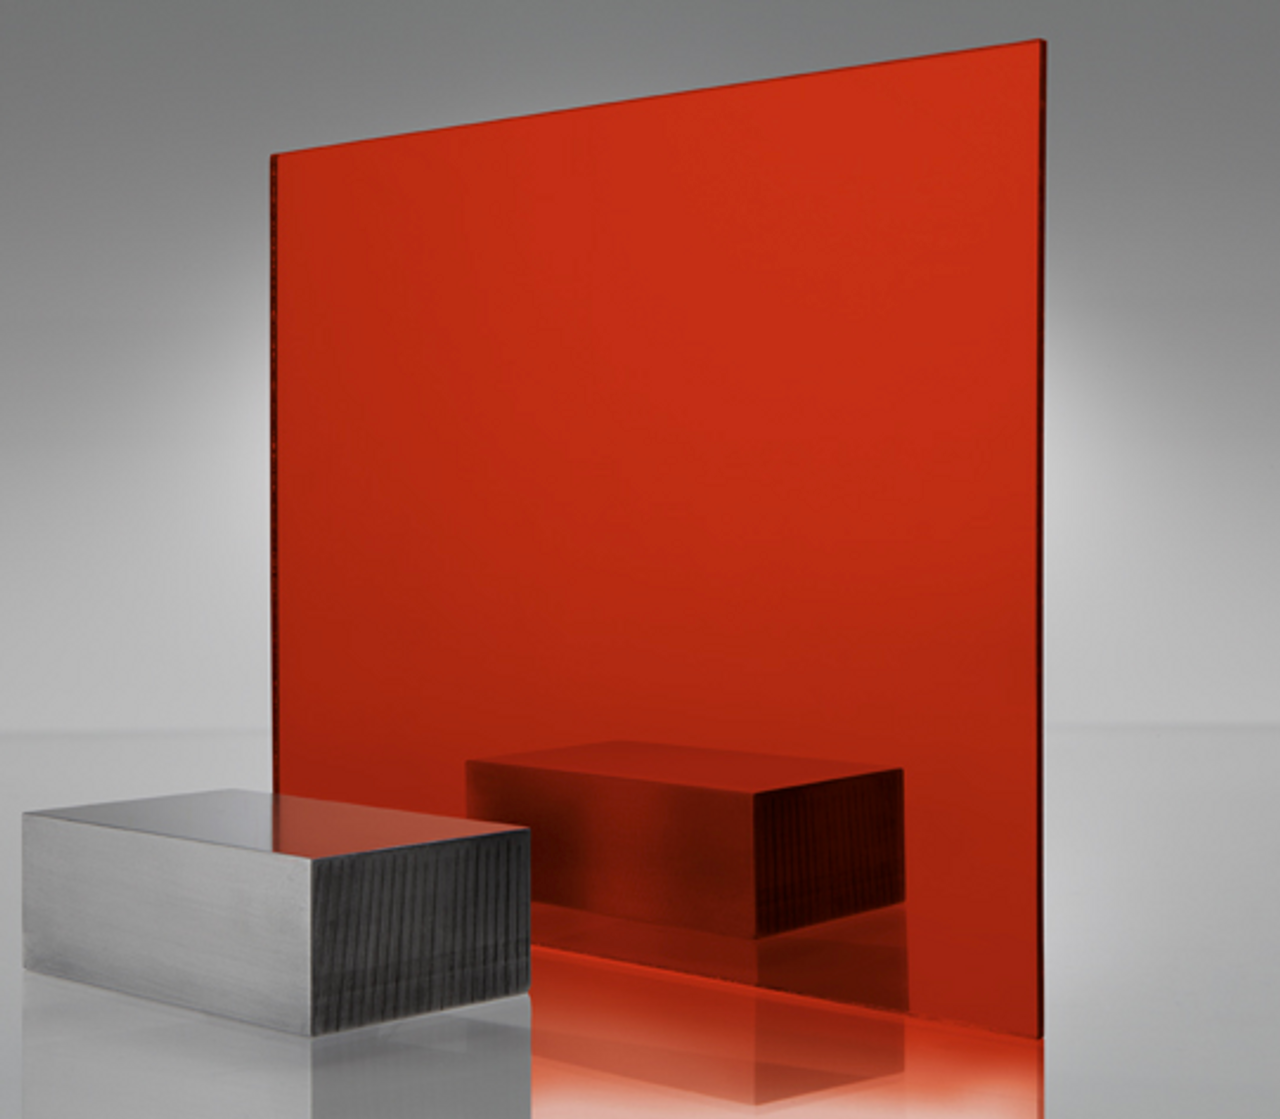 4x8' Mirrored Acrylic RED Light